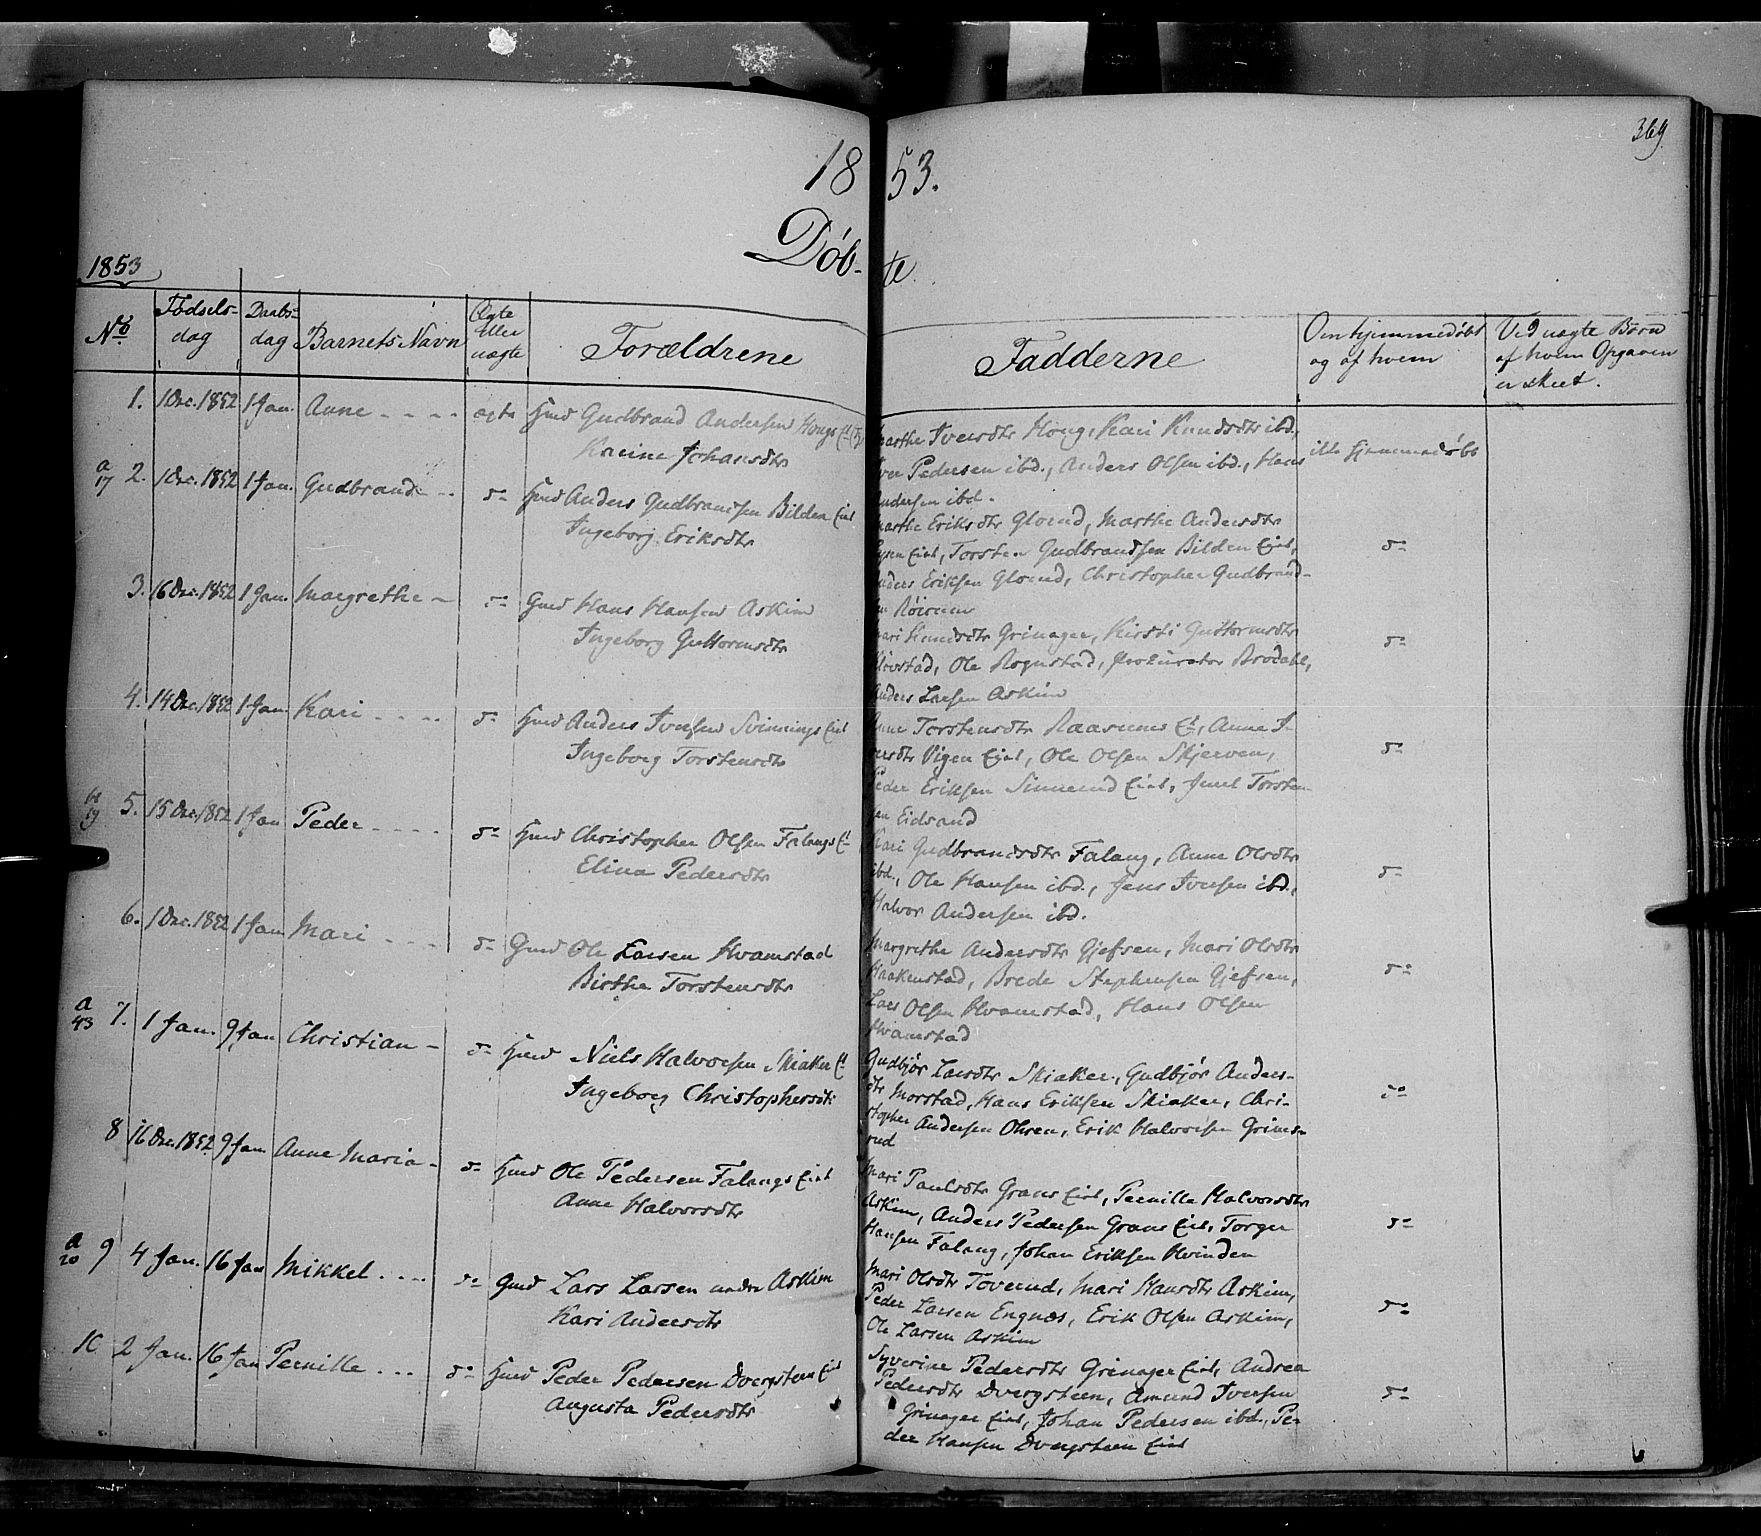 SAH, Gran prestekontor, Ministerialbok nr. 11, 1842-1856, s. 368-369